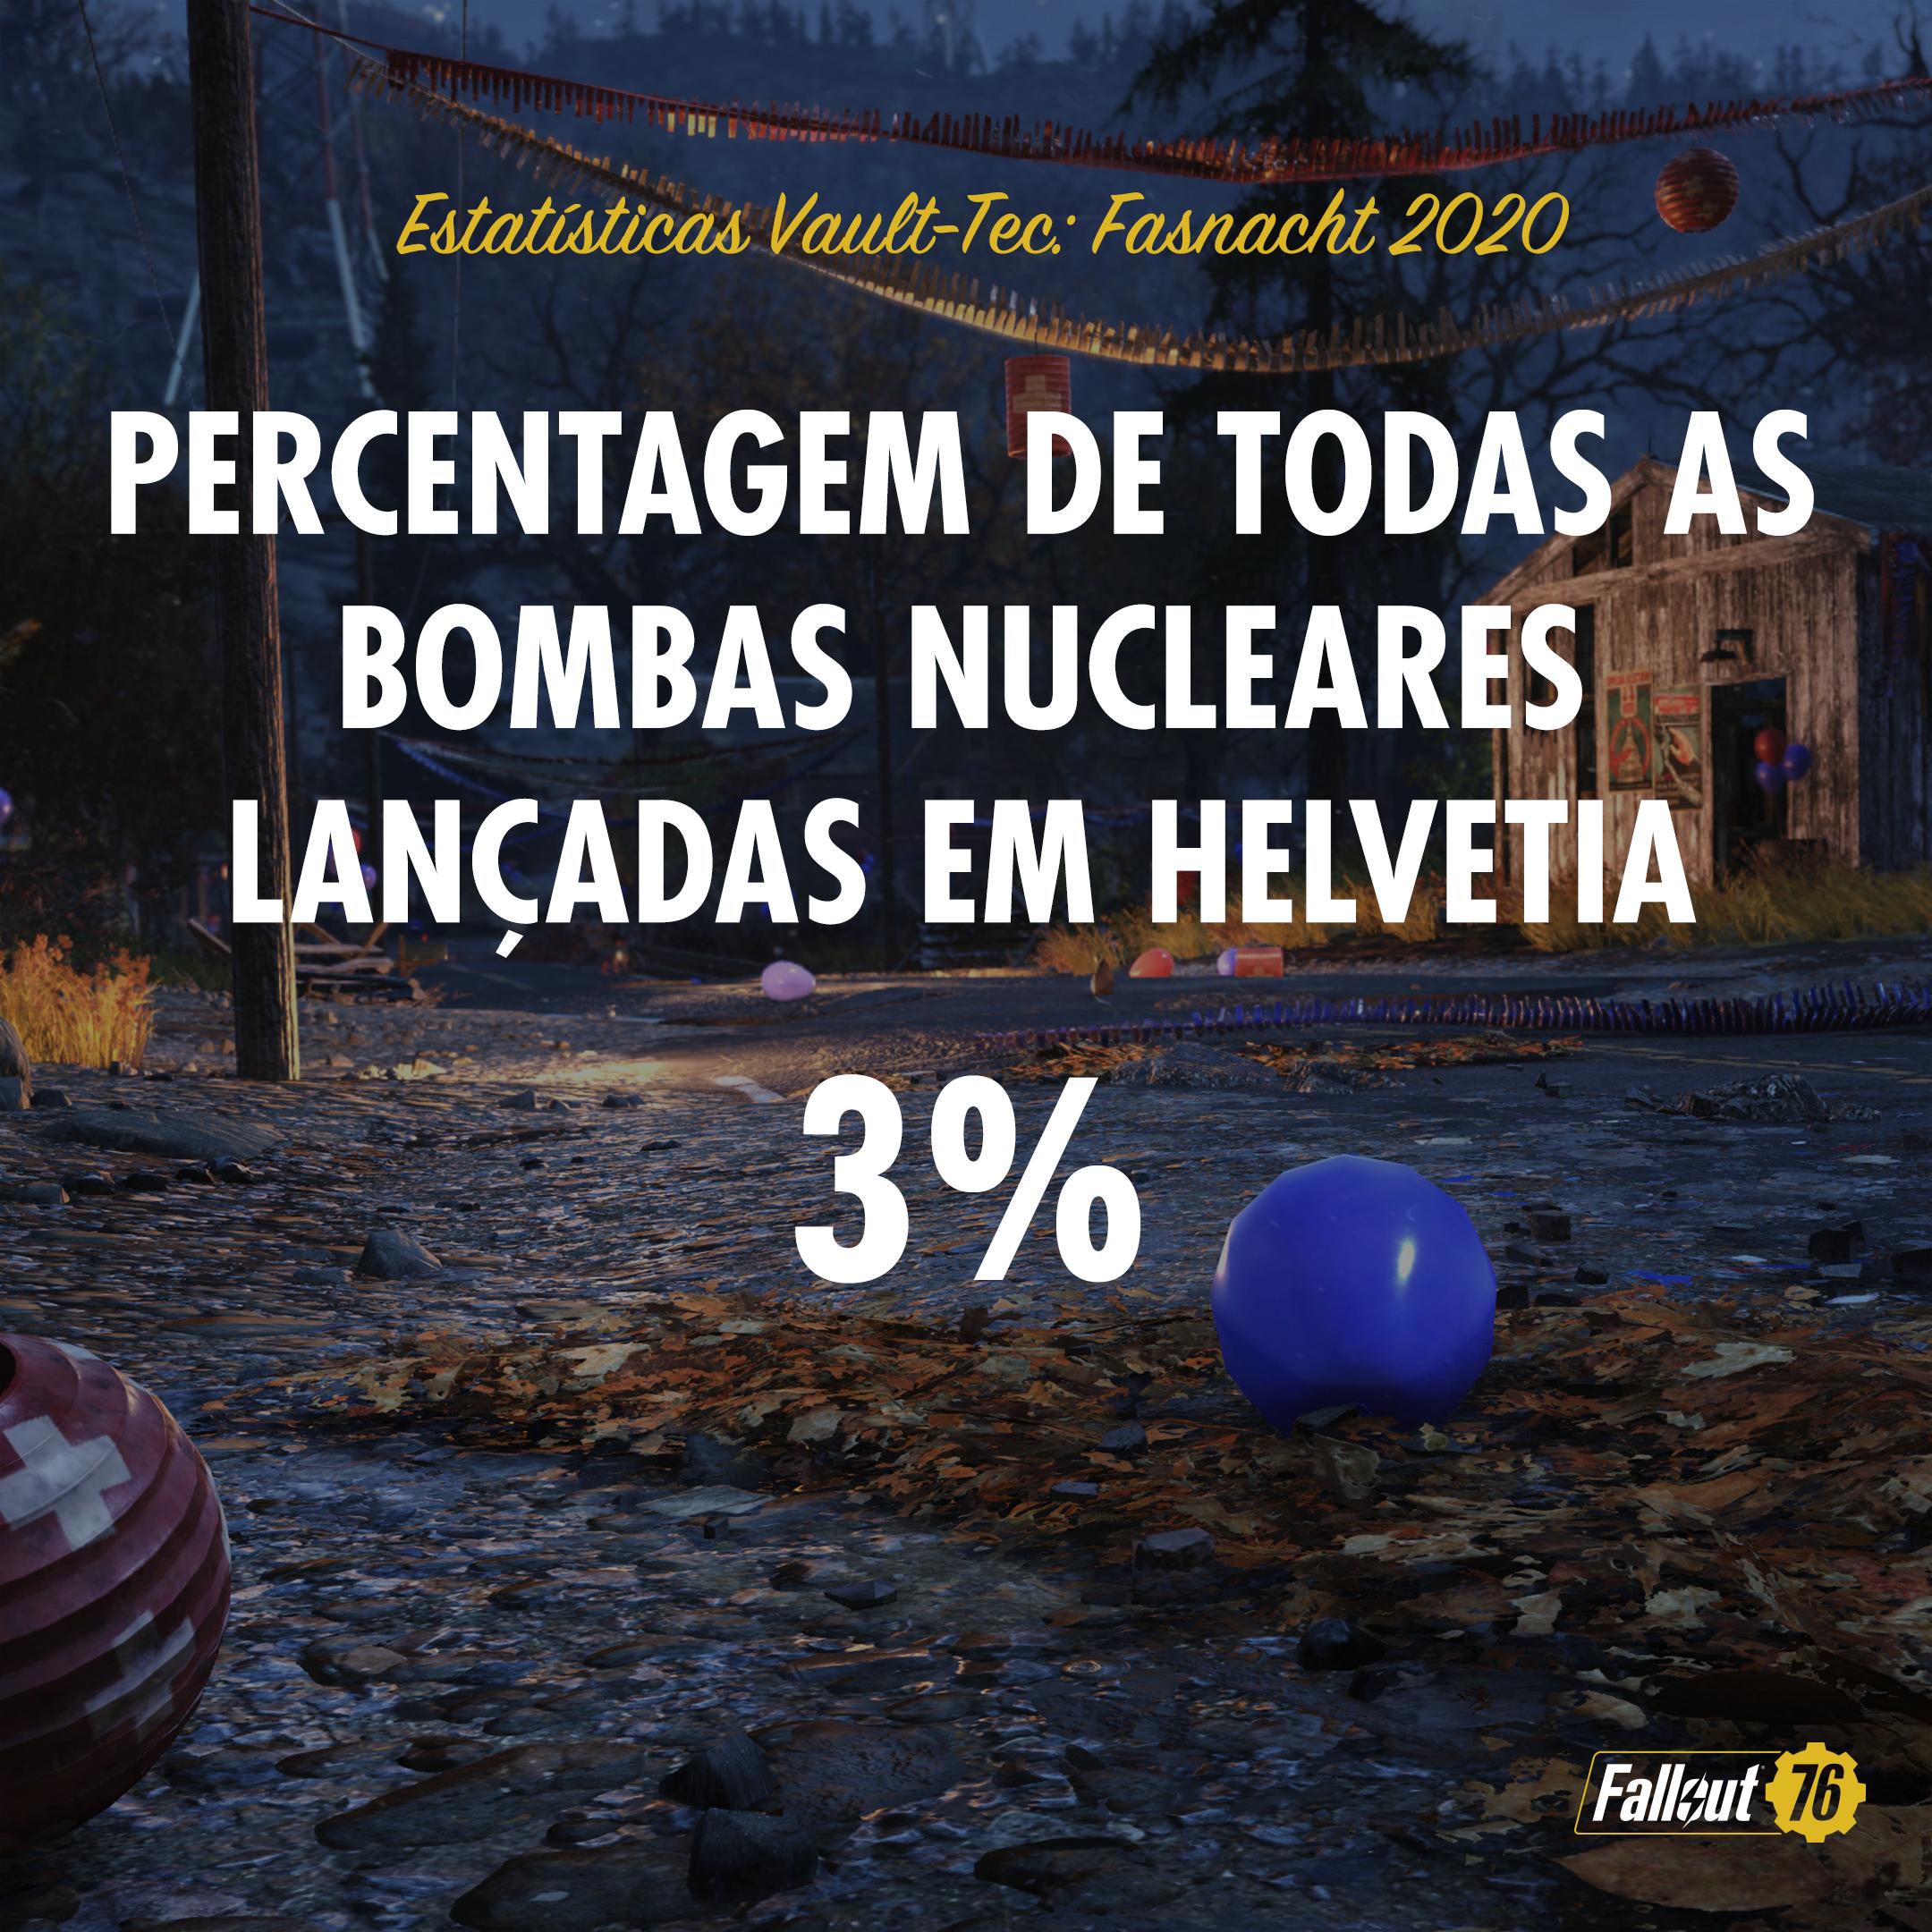 Fallout76 STATS Template 2160X2160 4K Fasnacht HelvetiaNukes PT